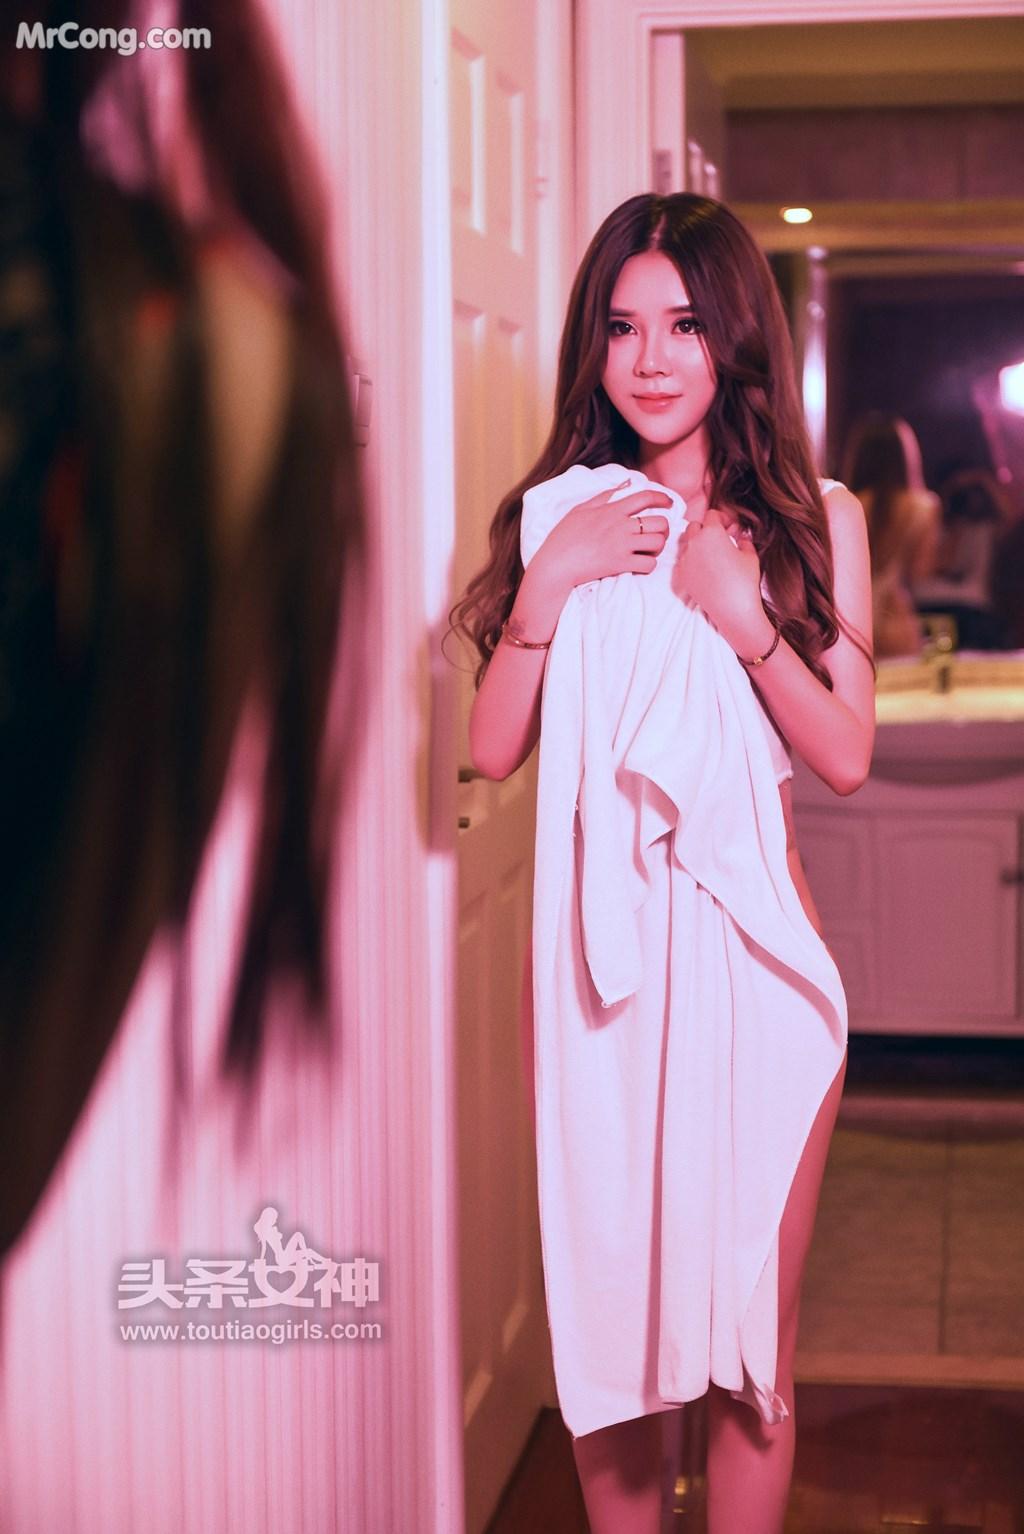 Image TouTiao-2017-08-18-Lisa-Aili-Sha--Jiu-Er-MrCong.com-025 in post TouTiao 2017-08-18: Người mẫu Lisa (爱丽莎) và Jiu Er (九儿) (52 ảnh)